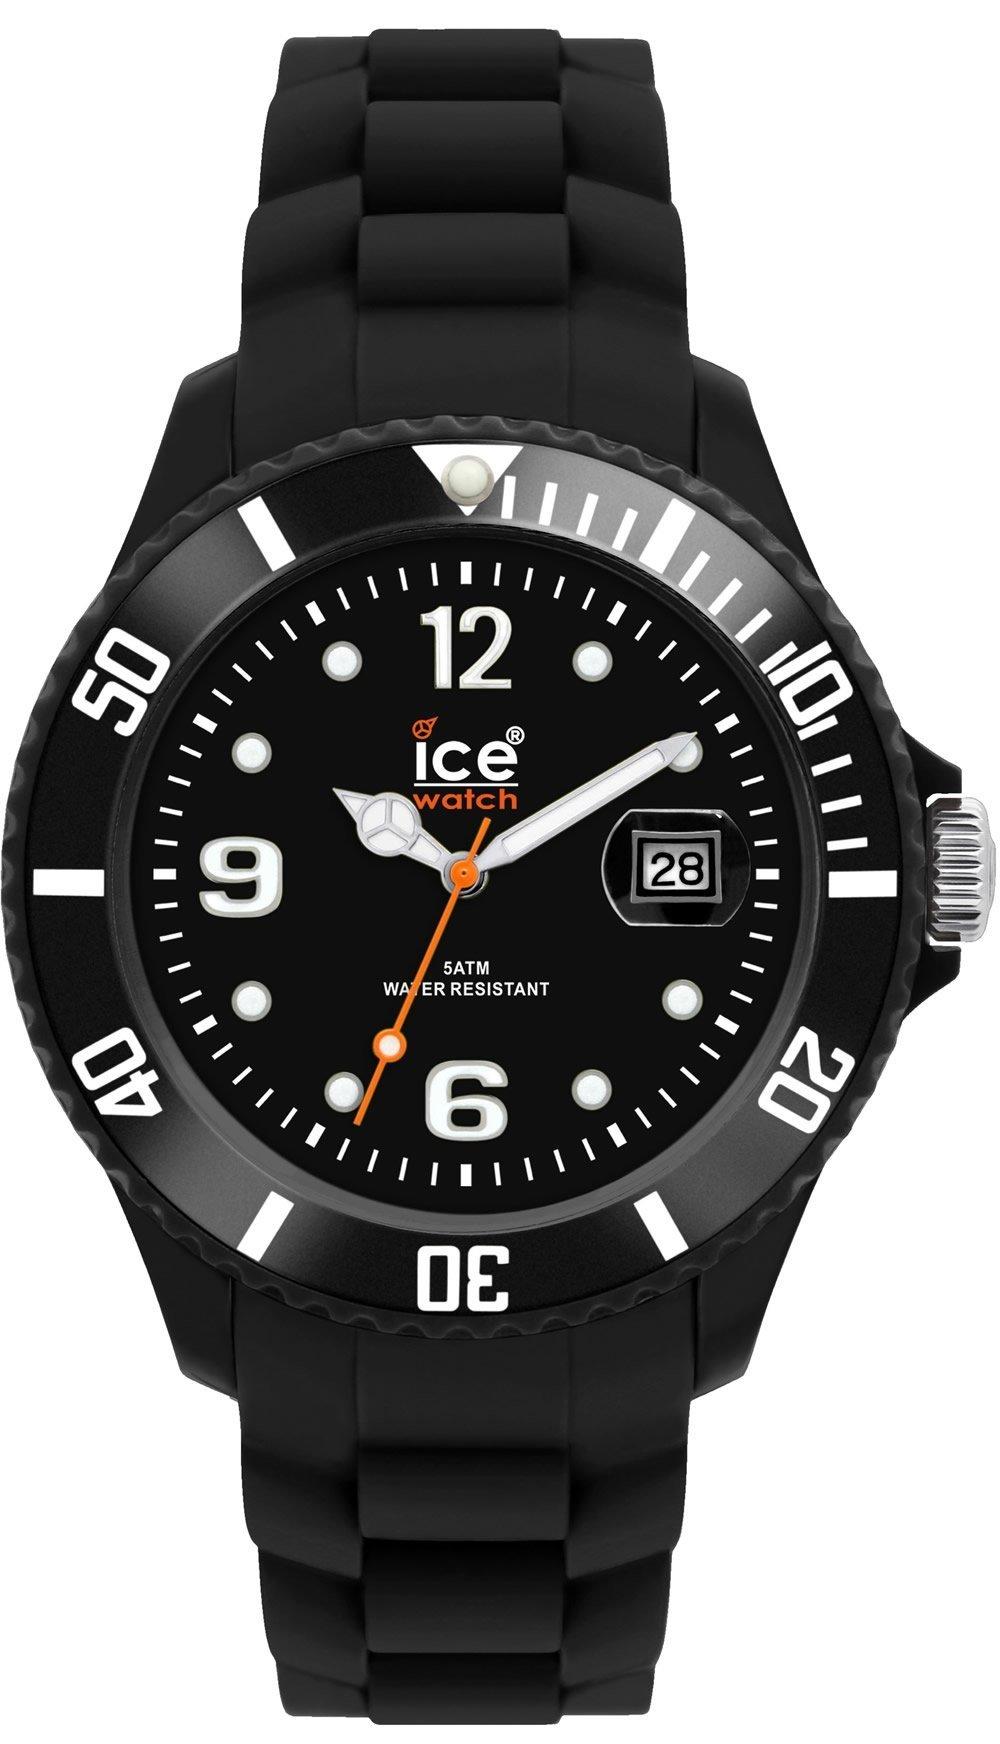 Ice-Watch - Ice Forever Schwarz - Herrenuhr mit Silikonarmband